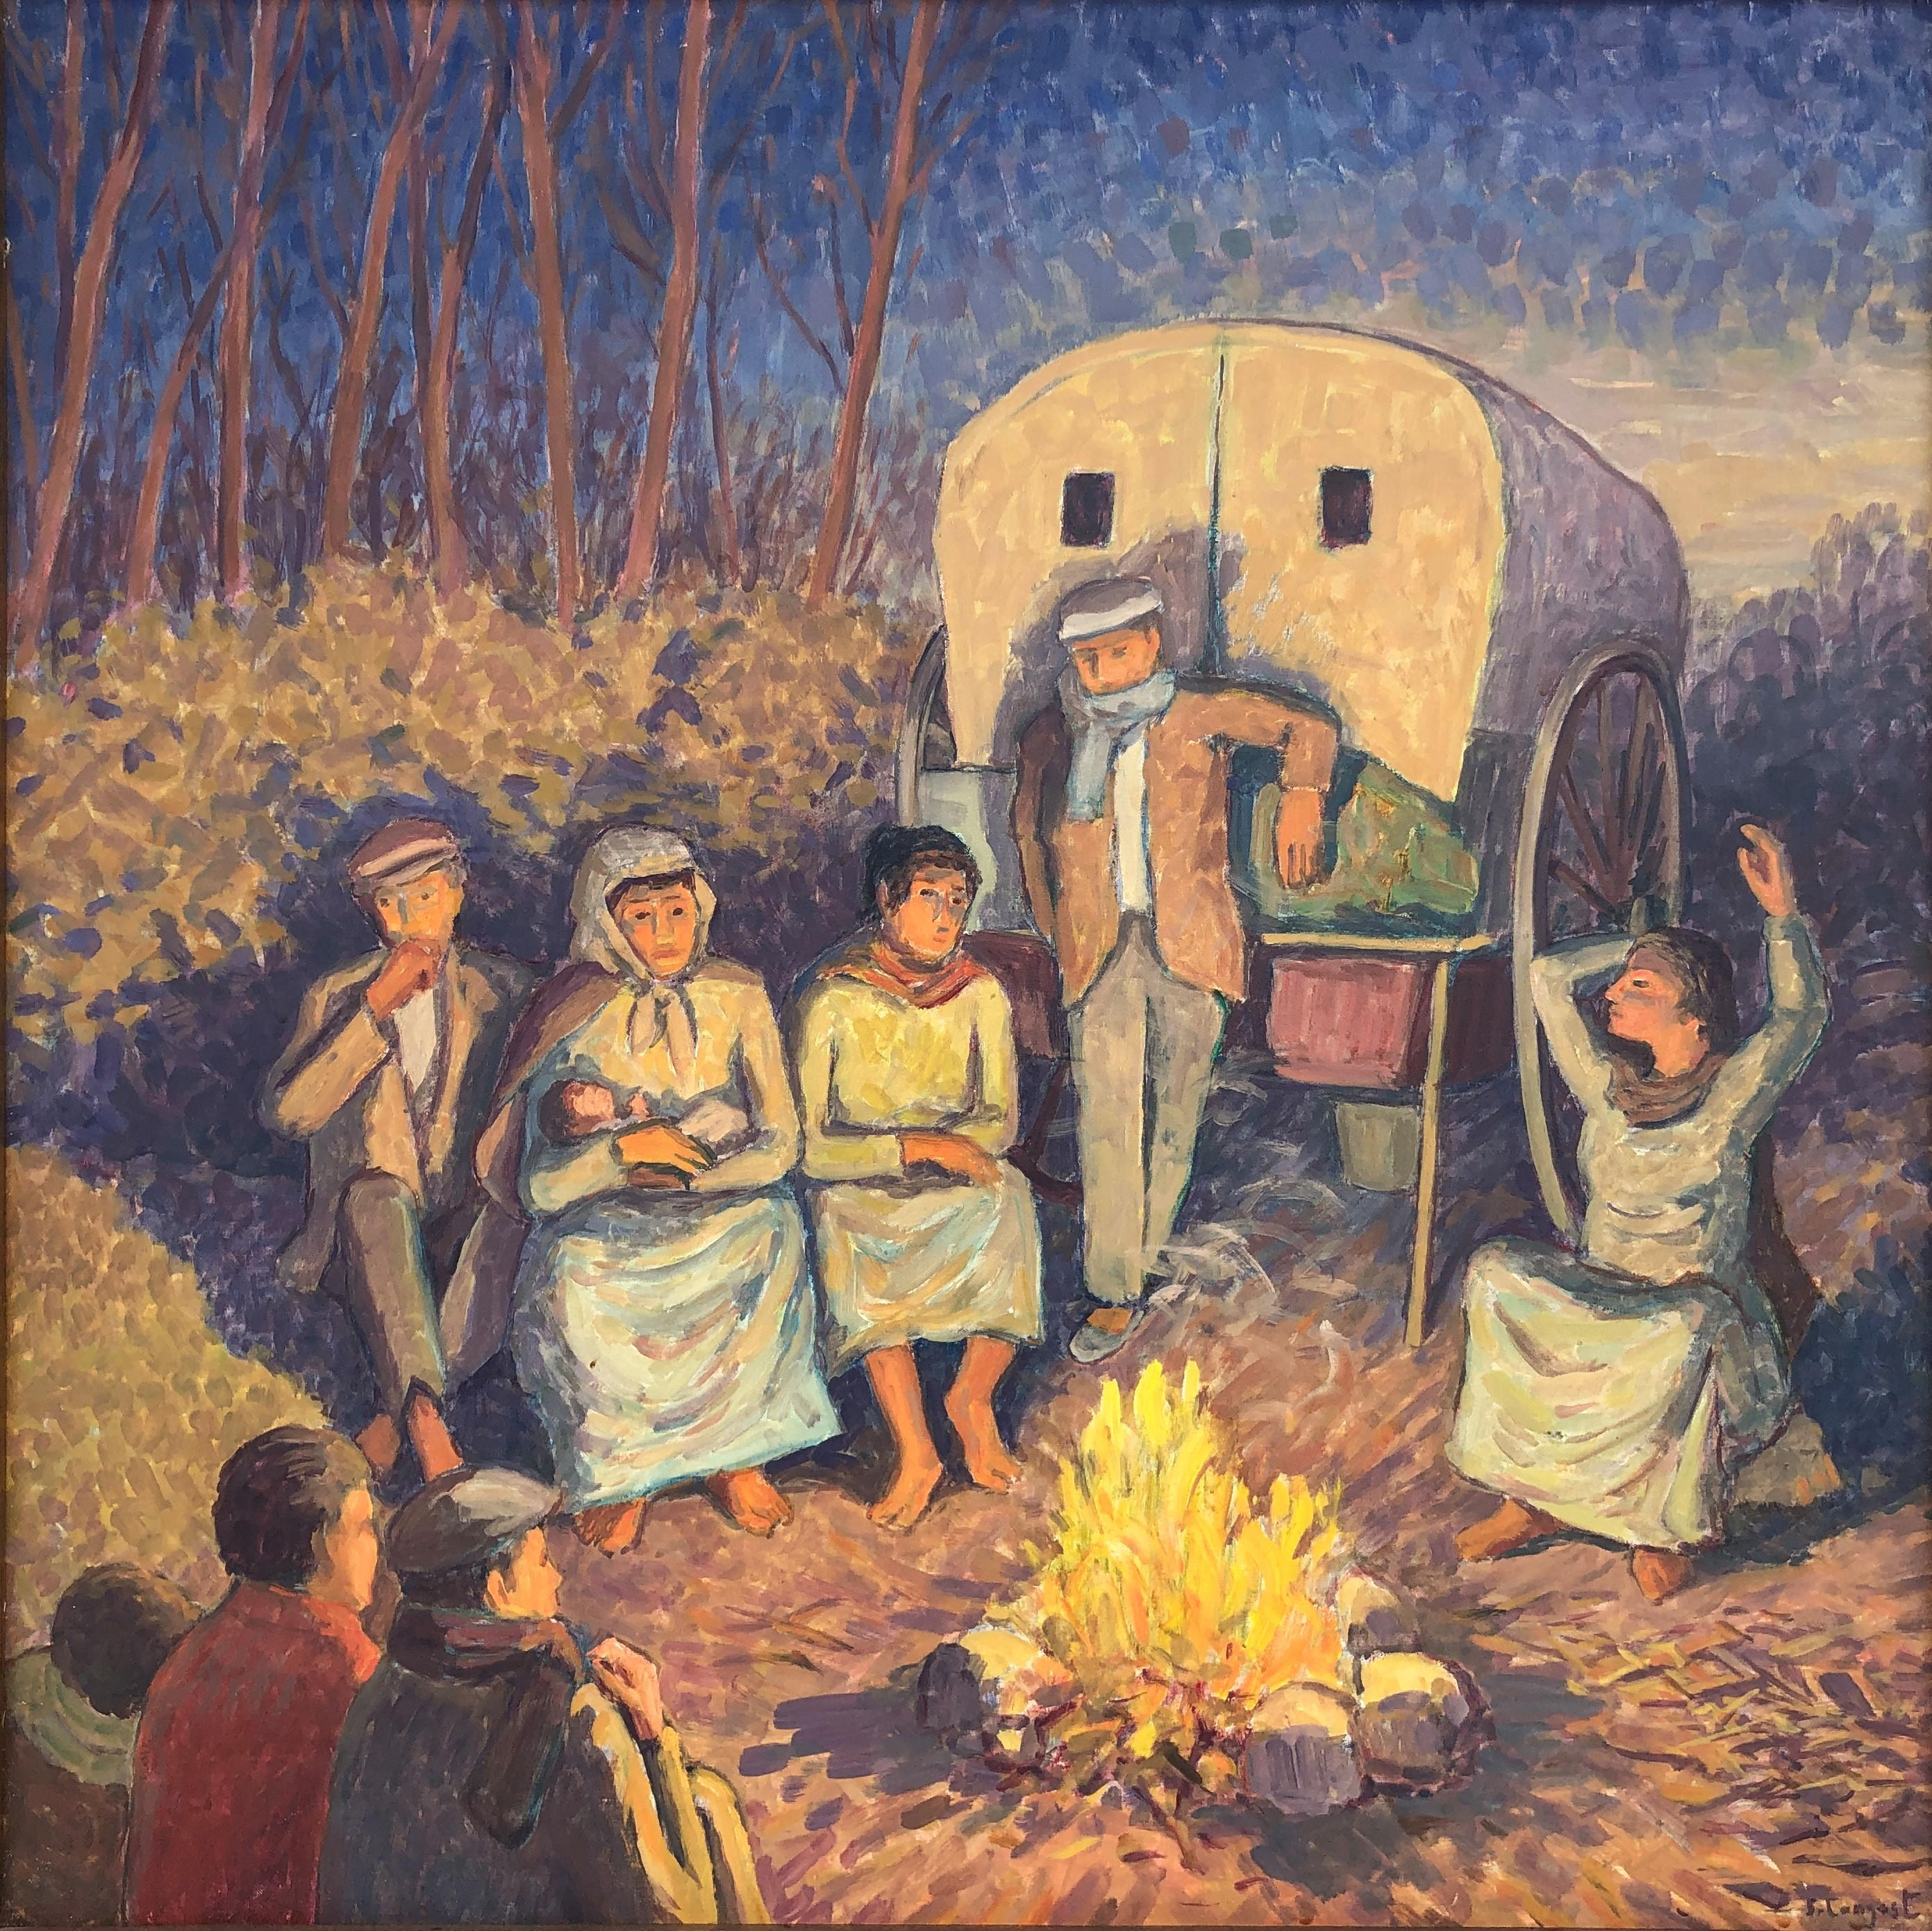 Gypsy caravan oil on canvas painting